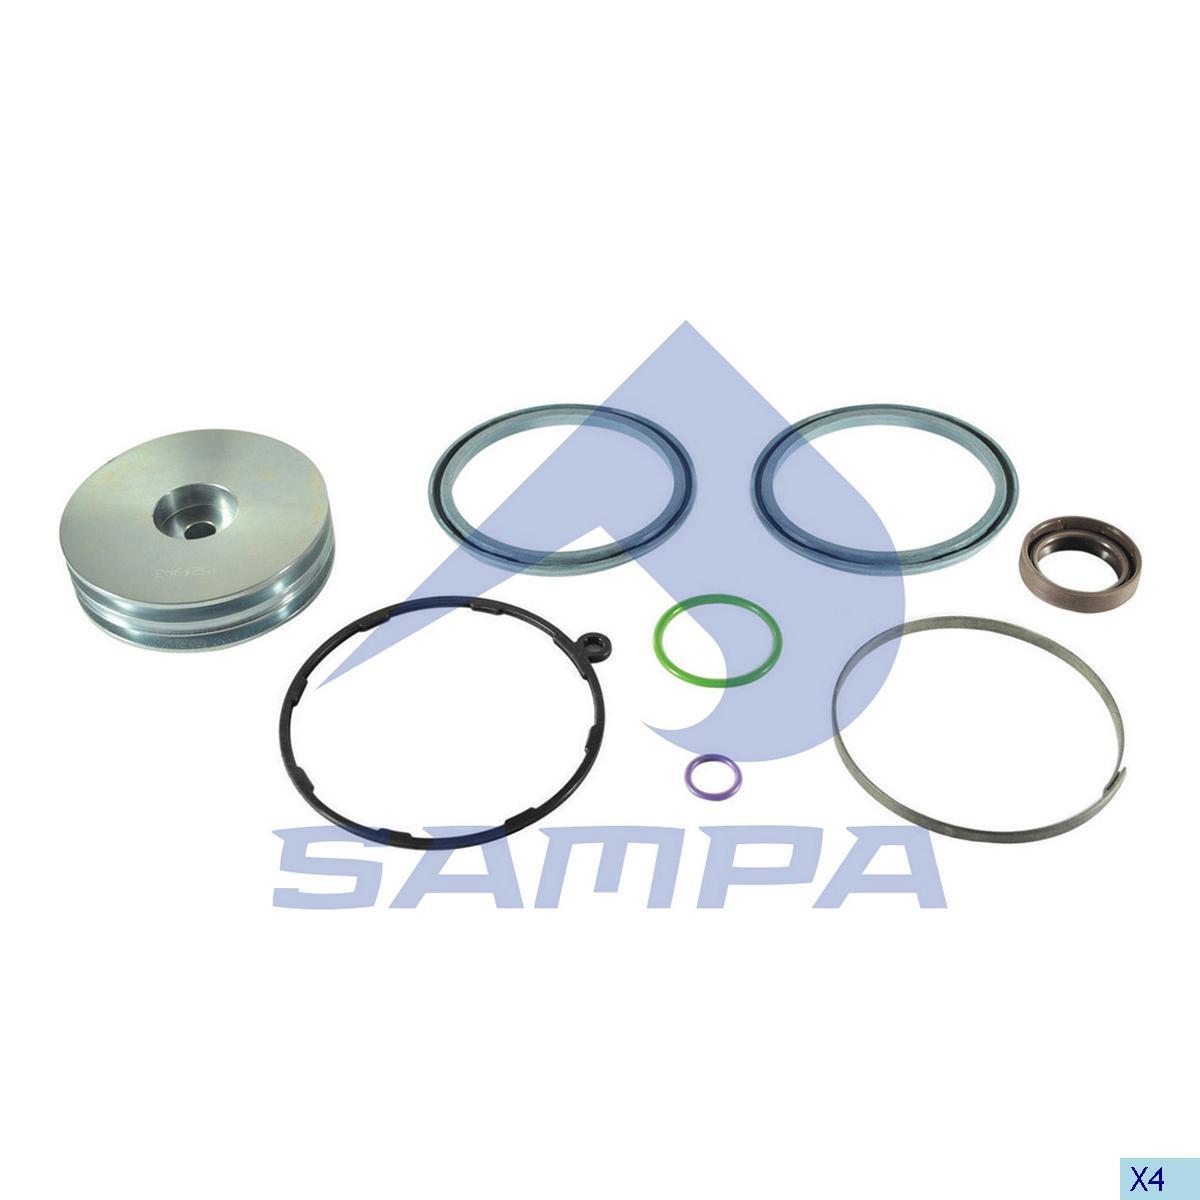 Repair Kit, Gear Shift Control, Volvo, Gear Box